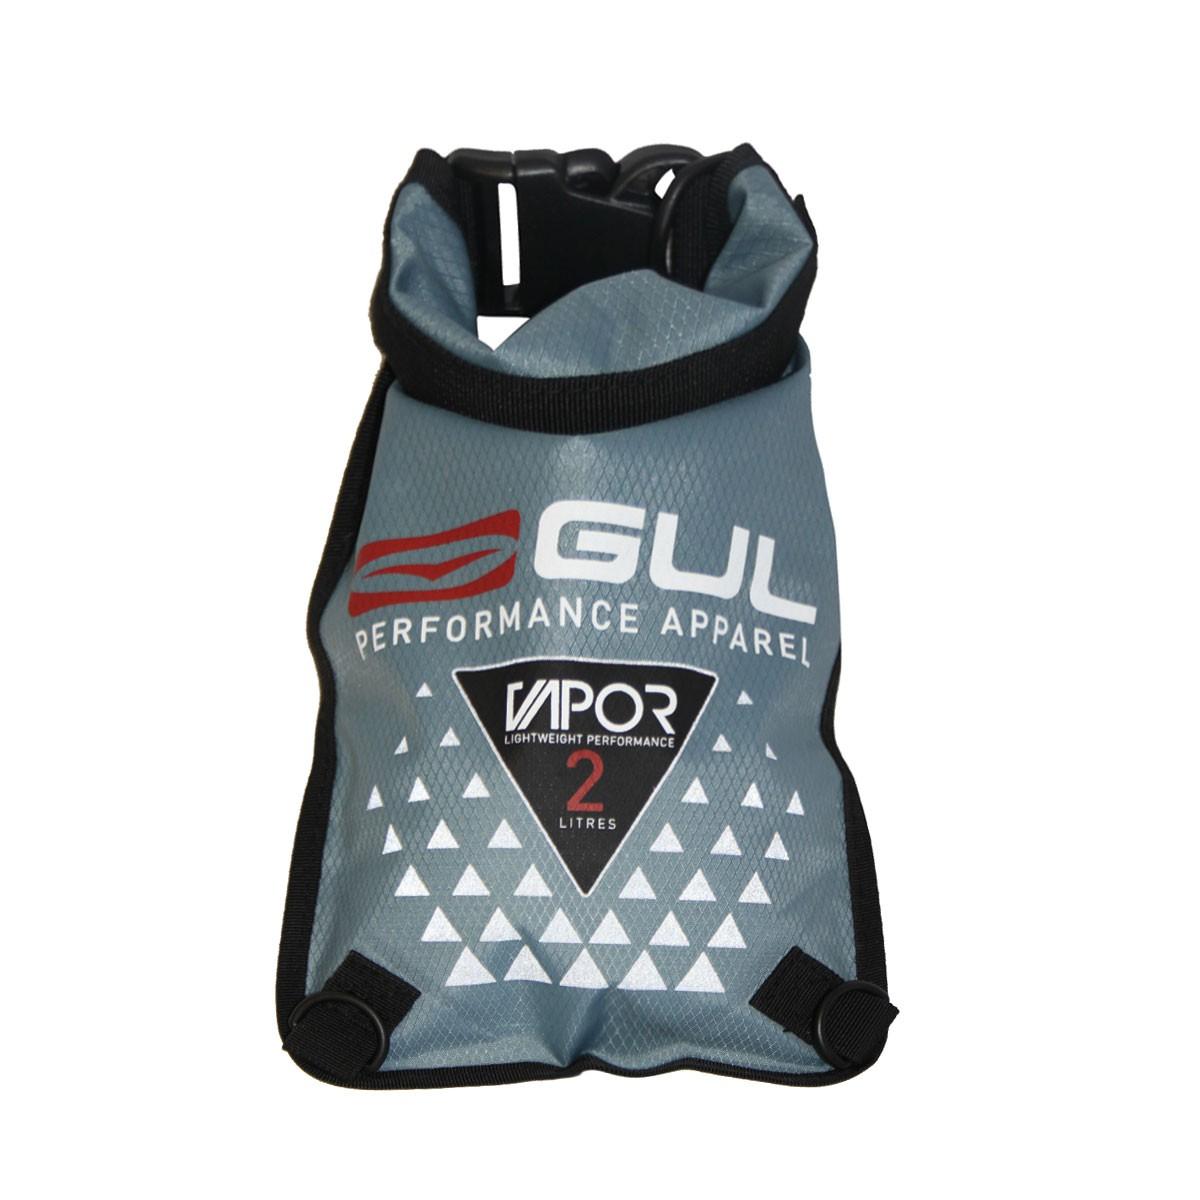 vodotěsný vak GUL 2L Vapour dry Bag LU0162